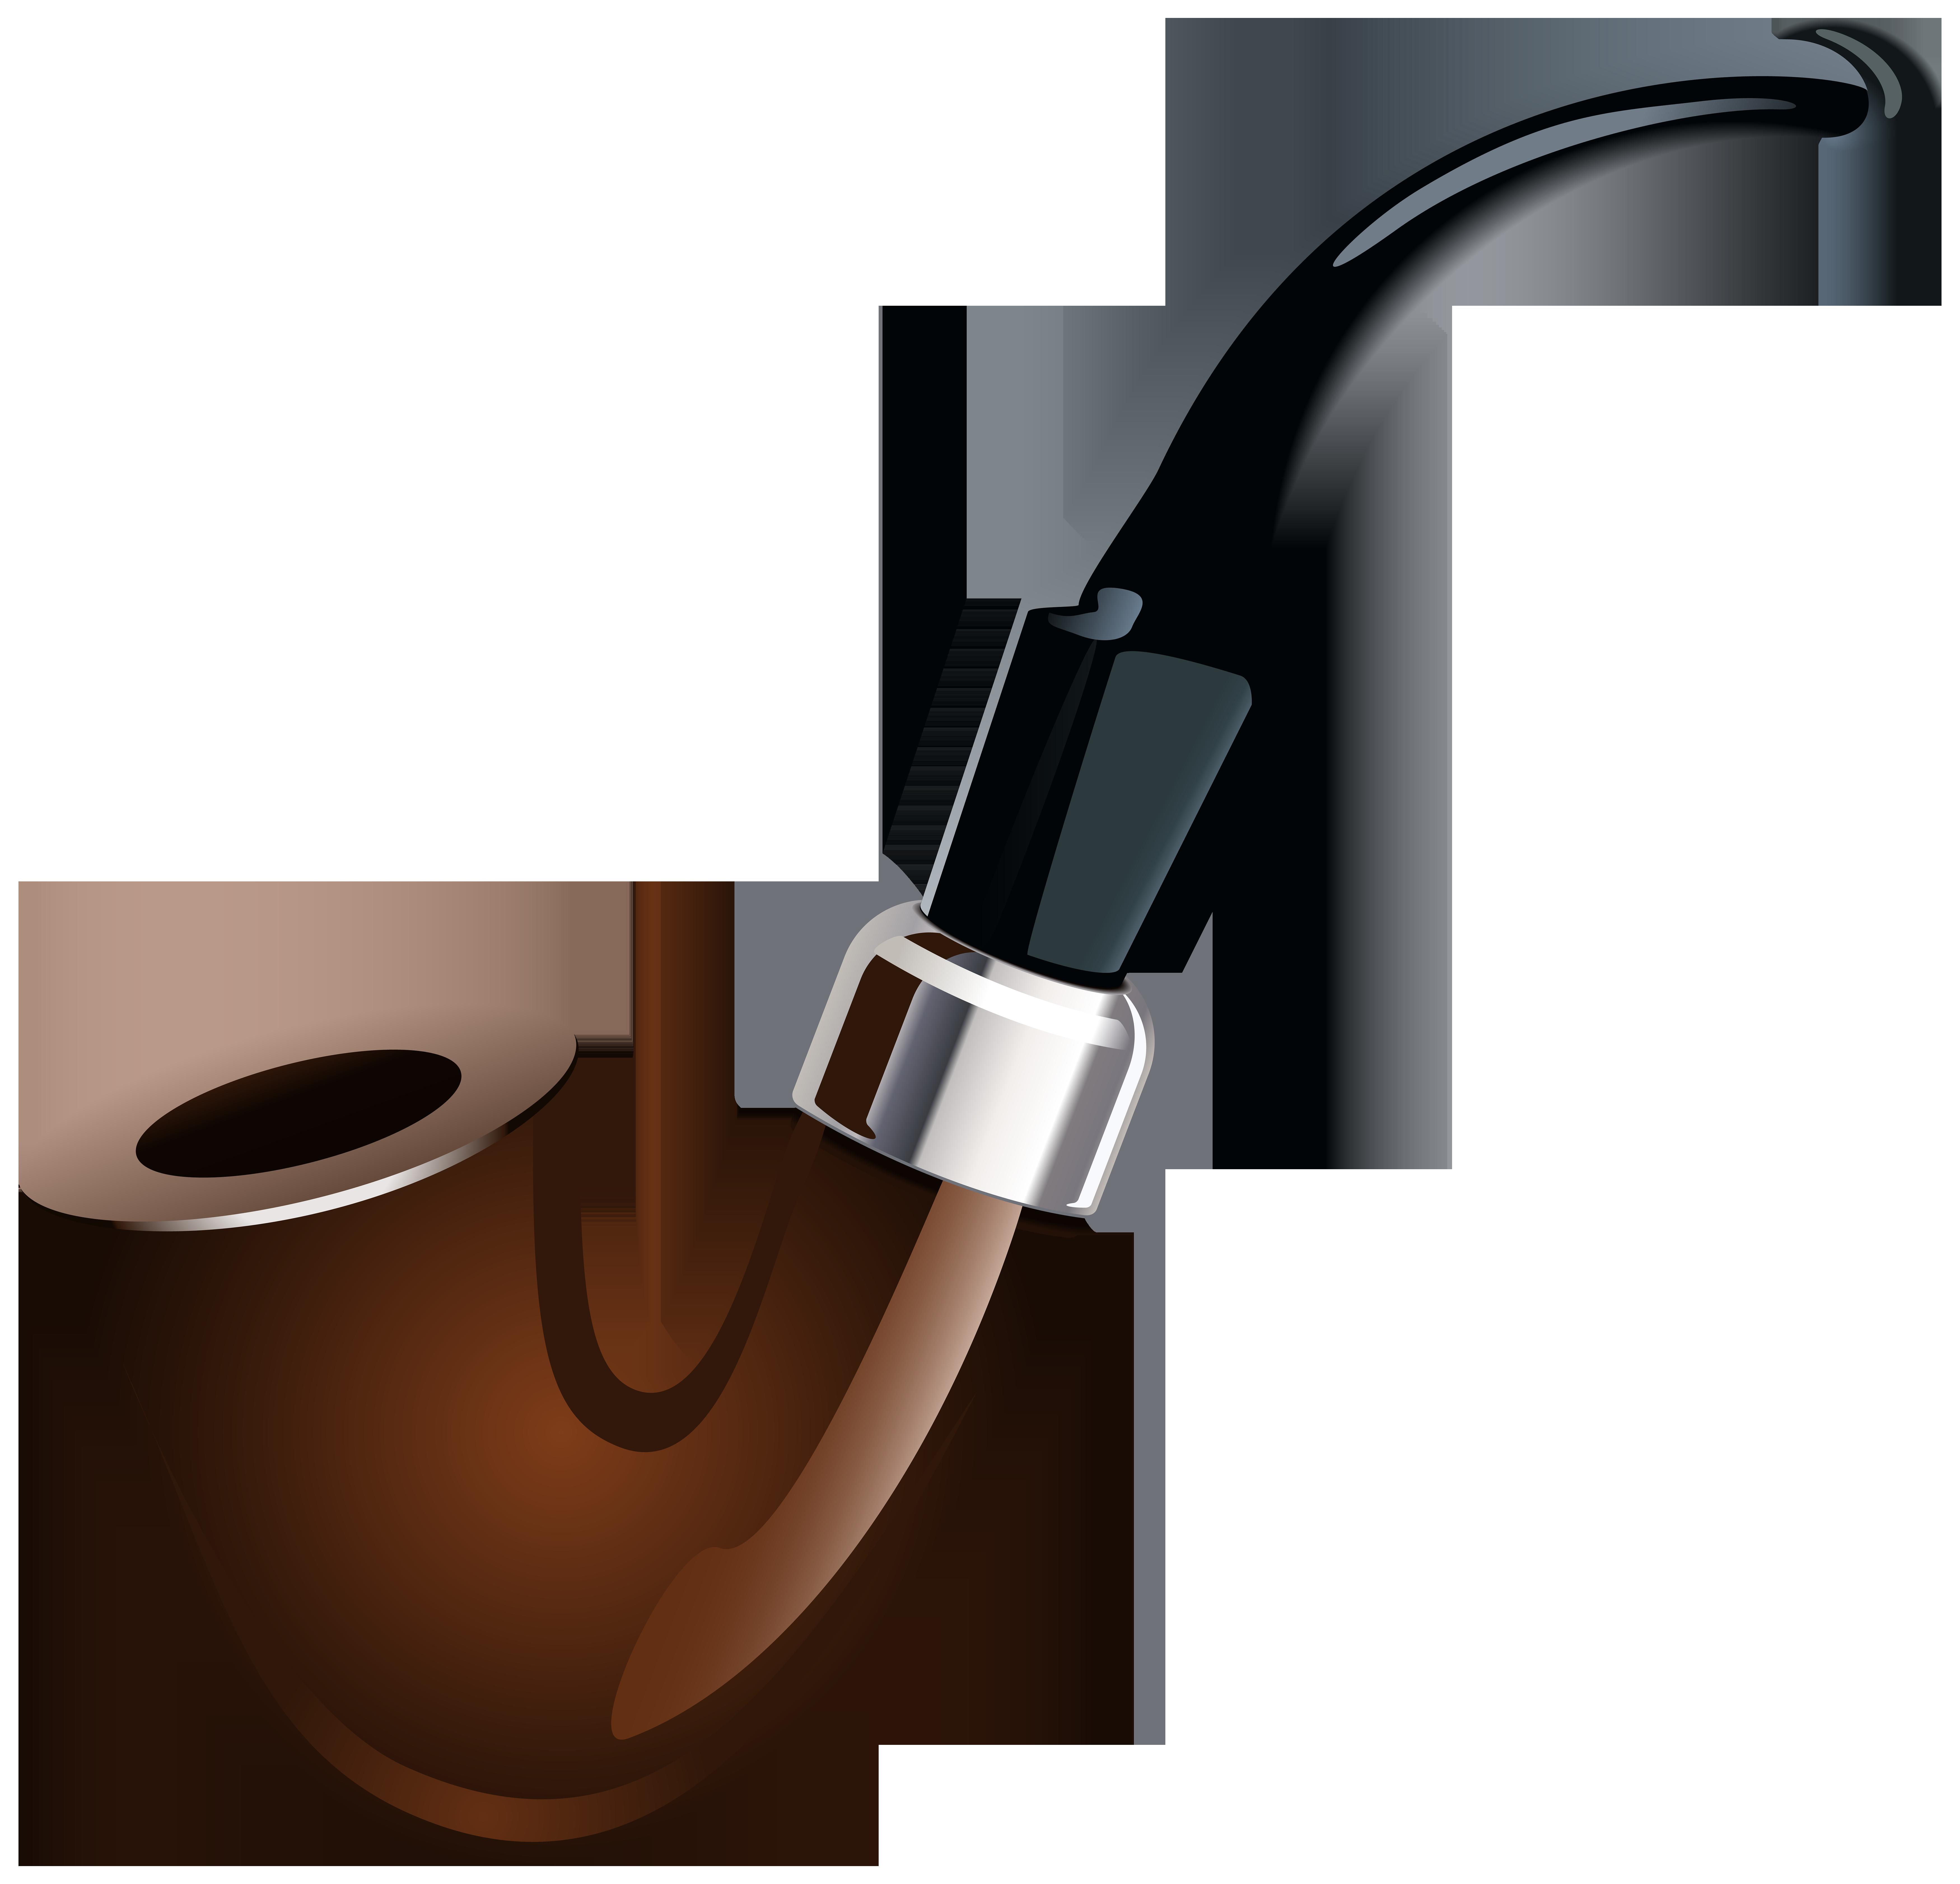 Tobacco Smoking Pipe Clip Art Web Clipar-Tobacco smoking pipe clip art web clipart-18